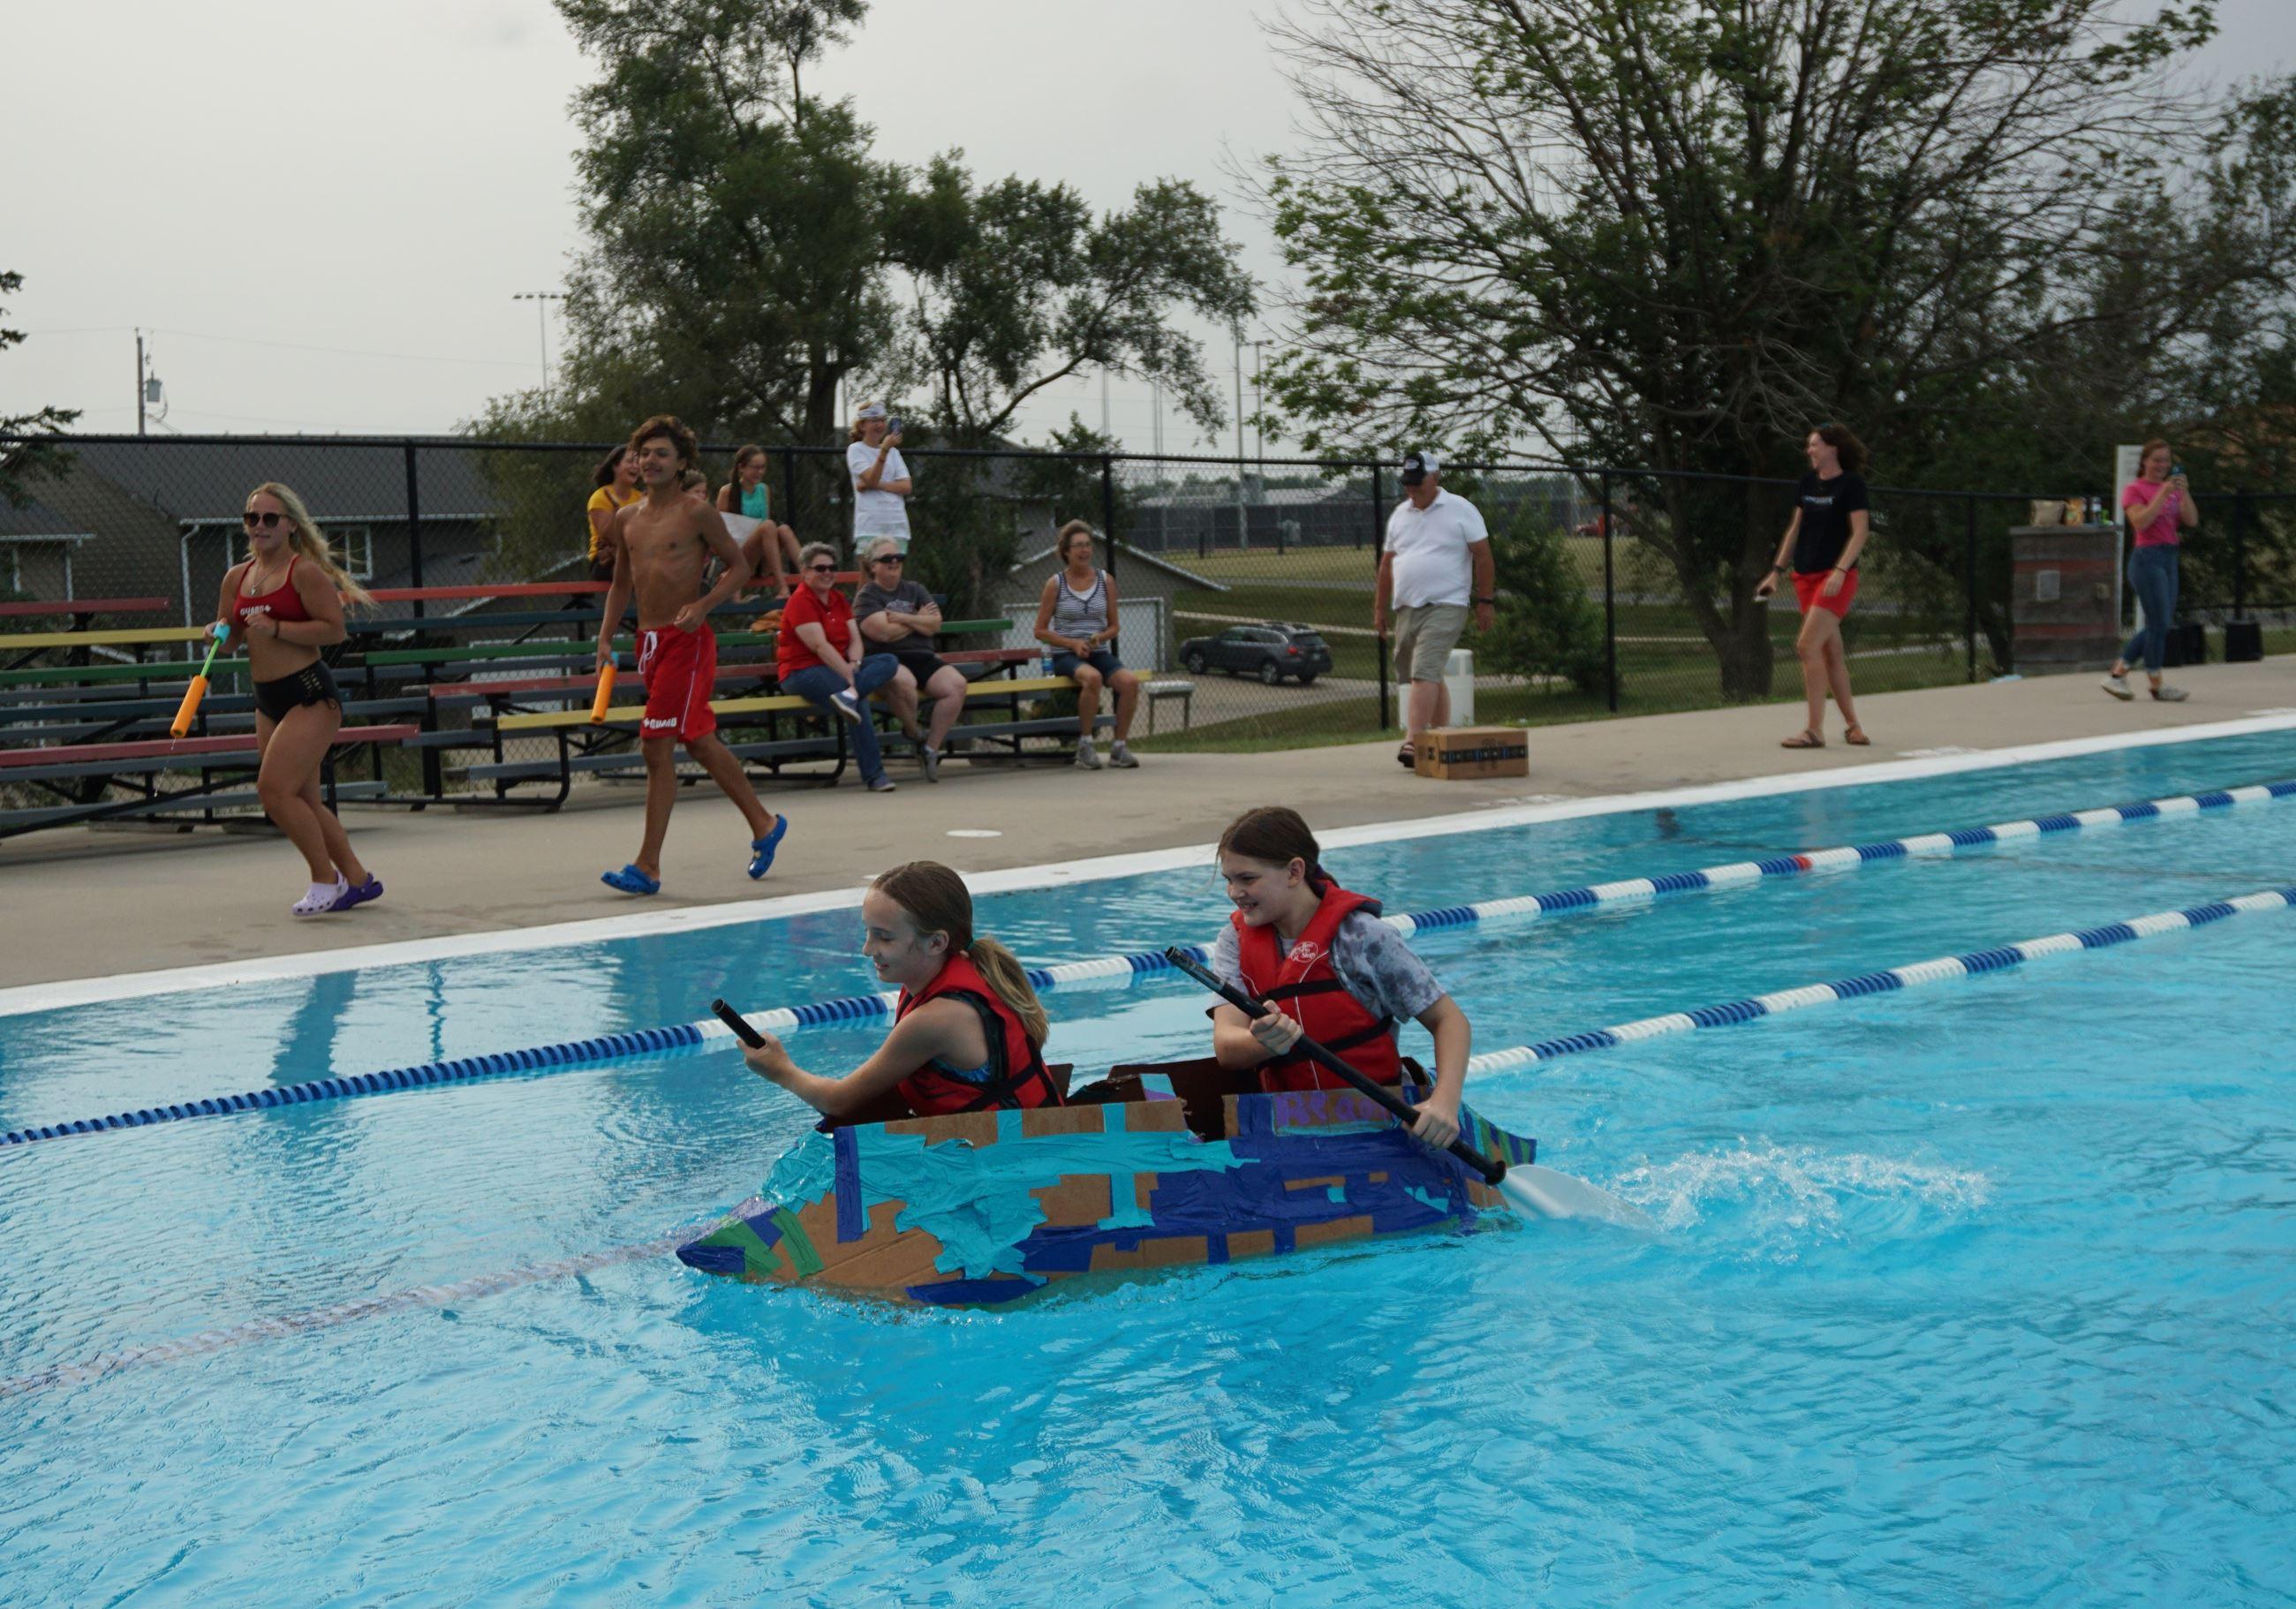 Fastest Boat Age 11-14